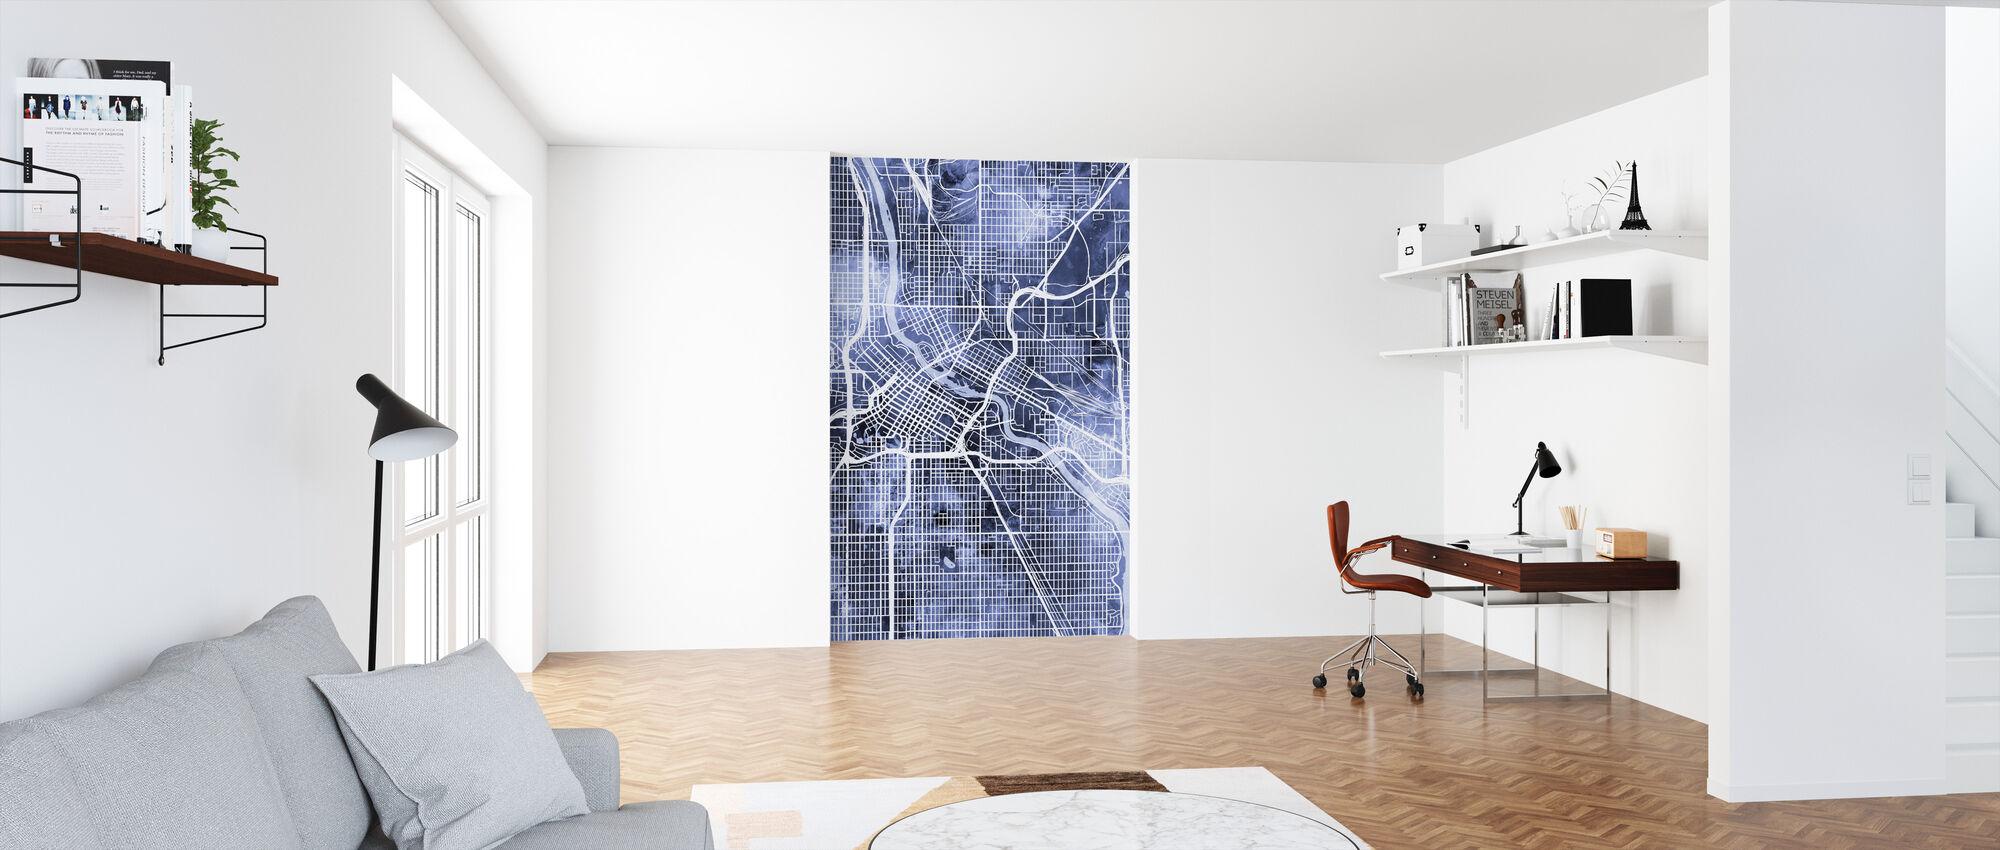 Minneapolis Minnesota Carte de la ville - Papier peint - Bureau